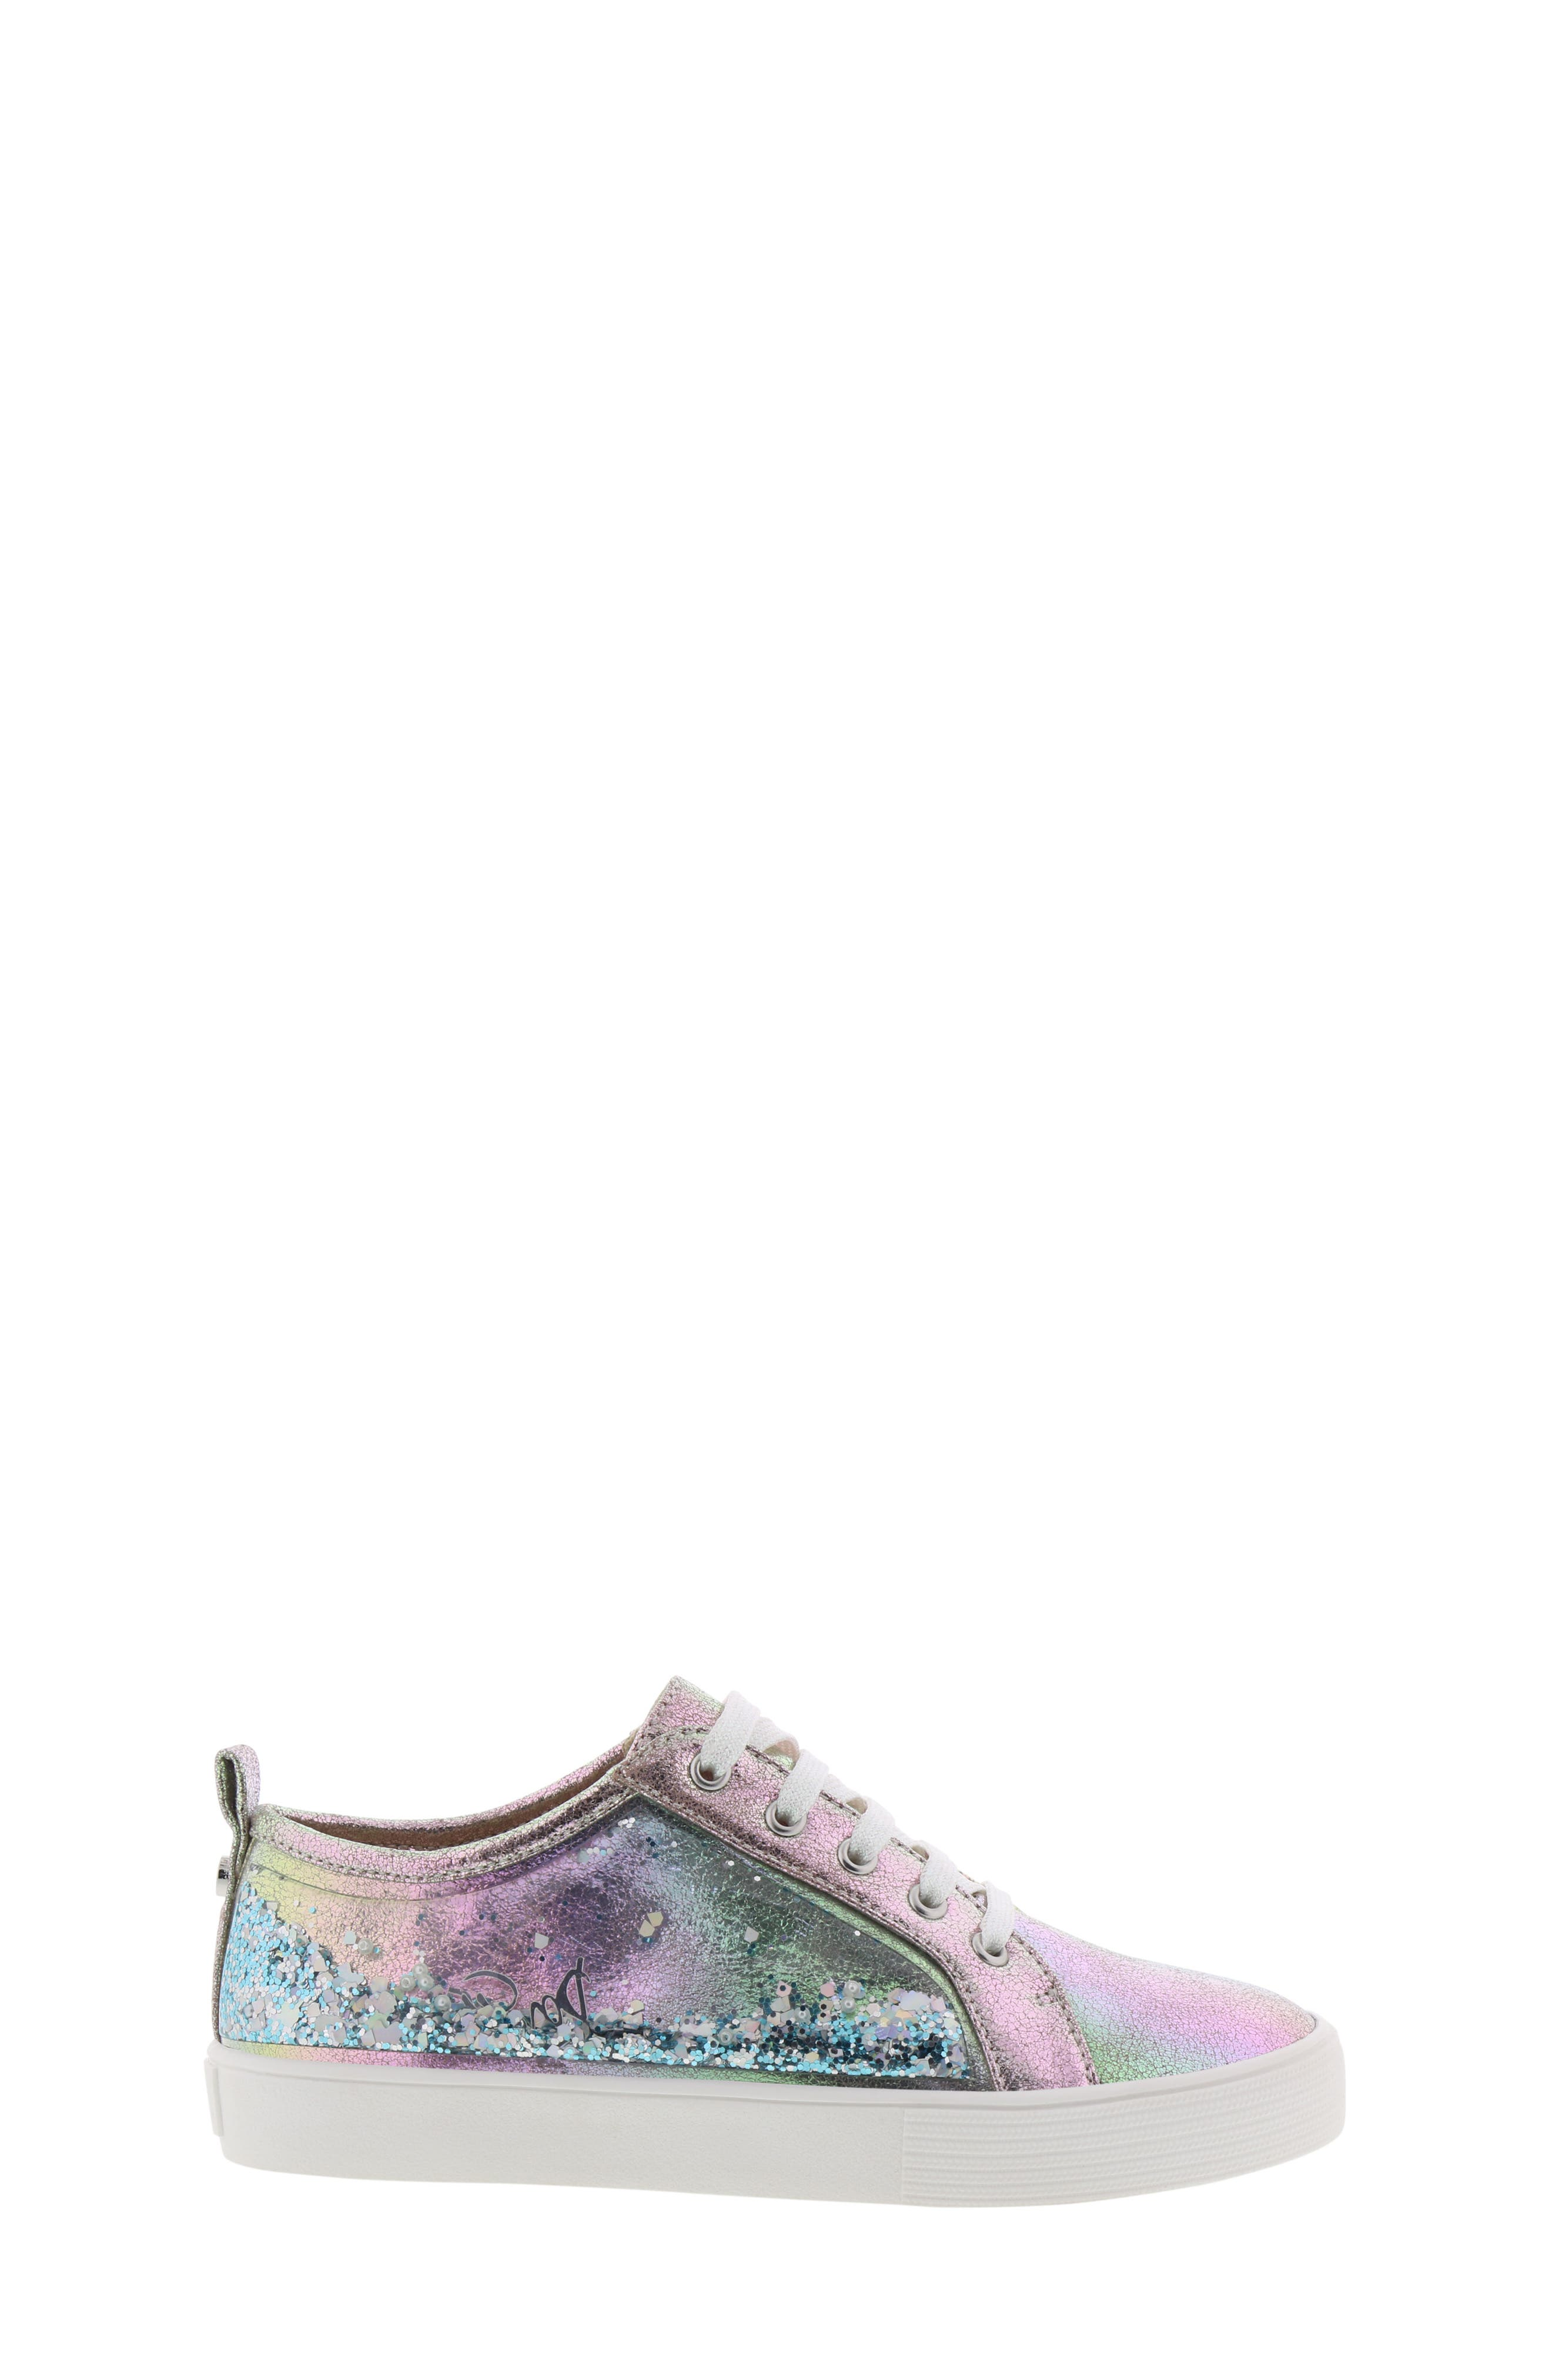 Bella Aqua Slip-On Sneaker,                             Alternate thumbnail 3, color,                             GASOLINE IRIDESCENT